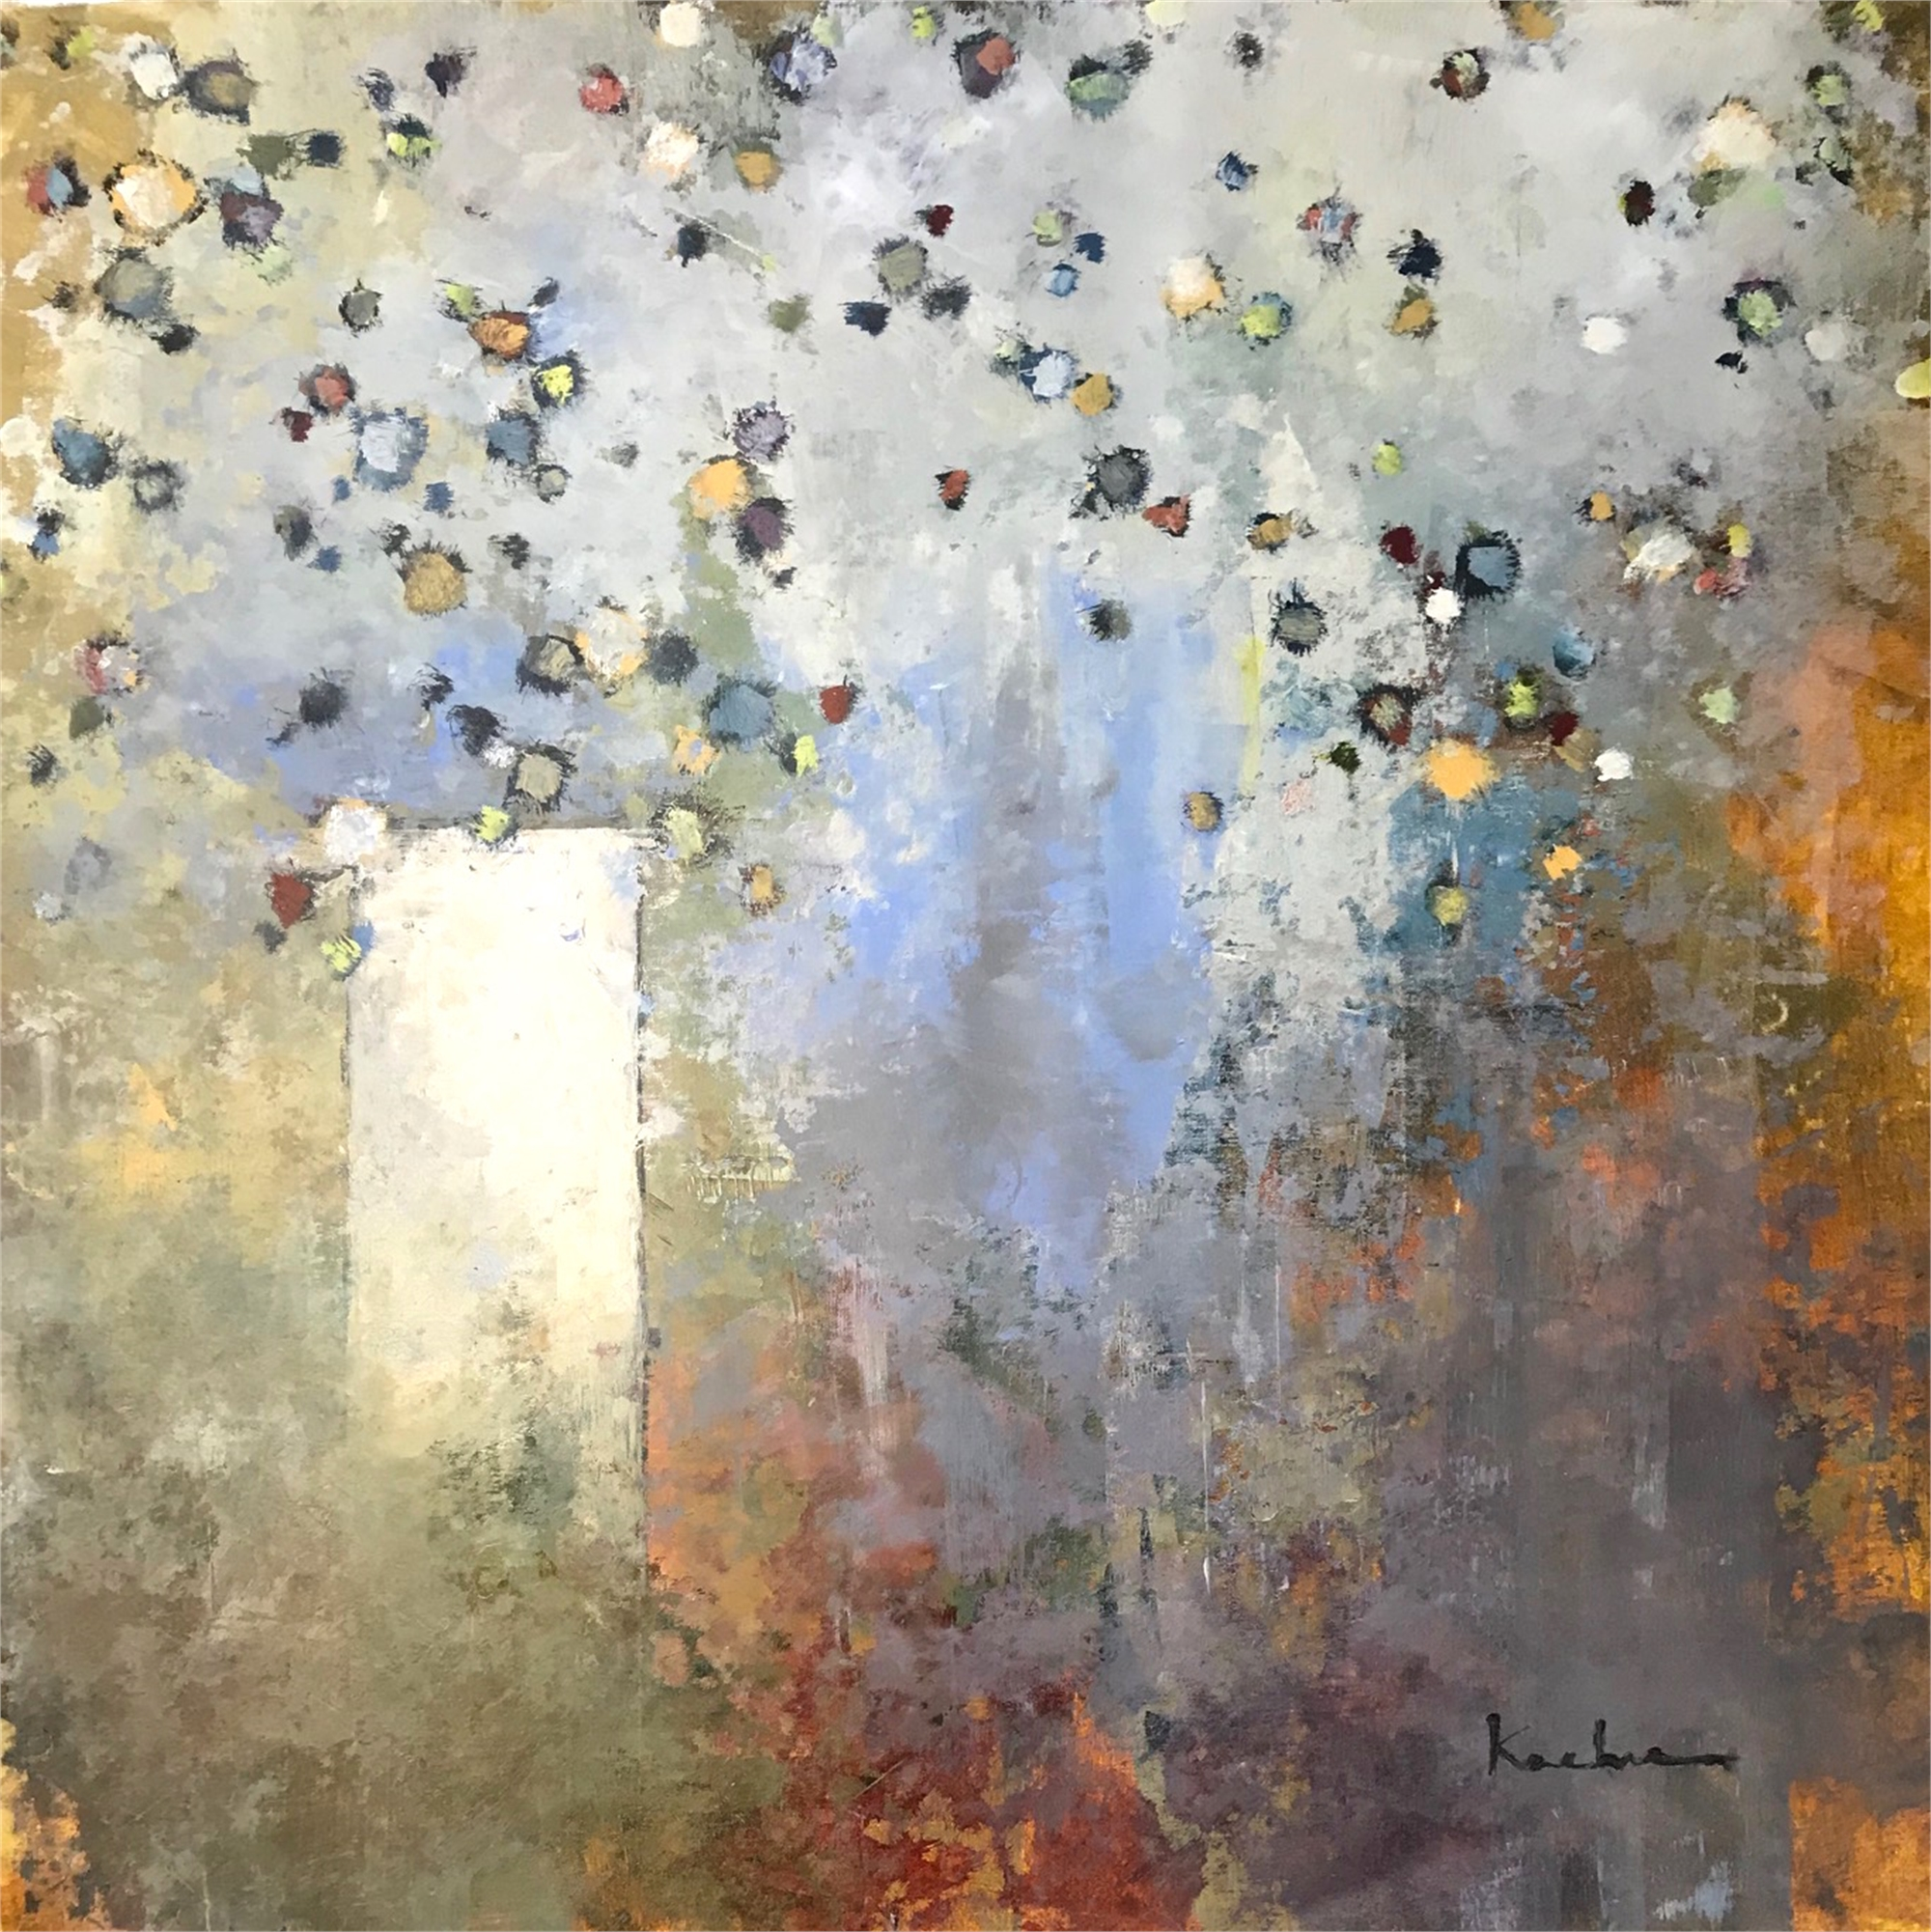 Peaceful Lullaby by Jeff Koehn